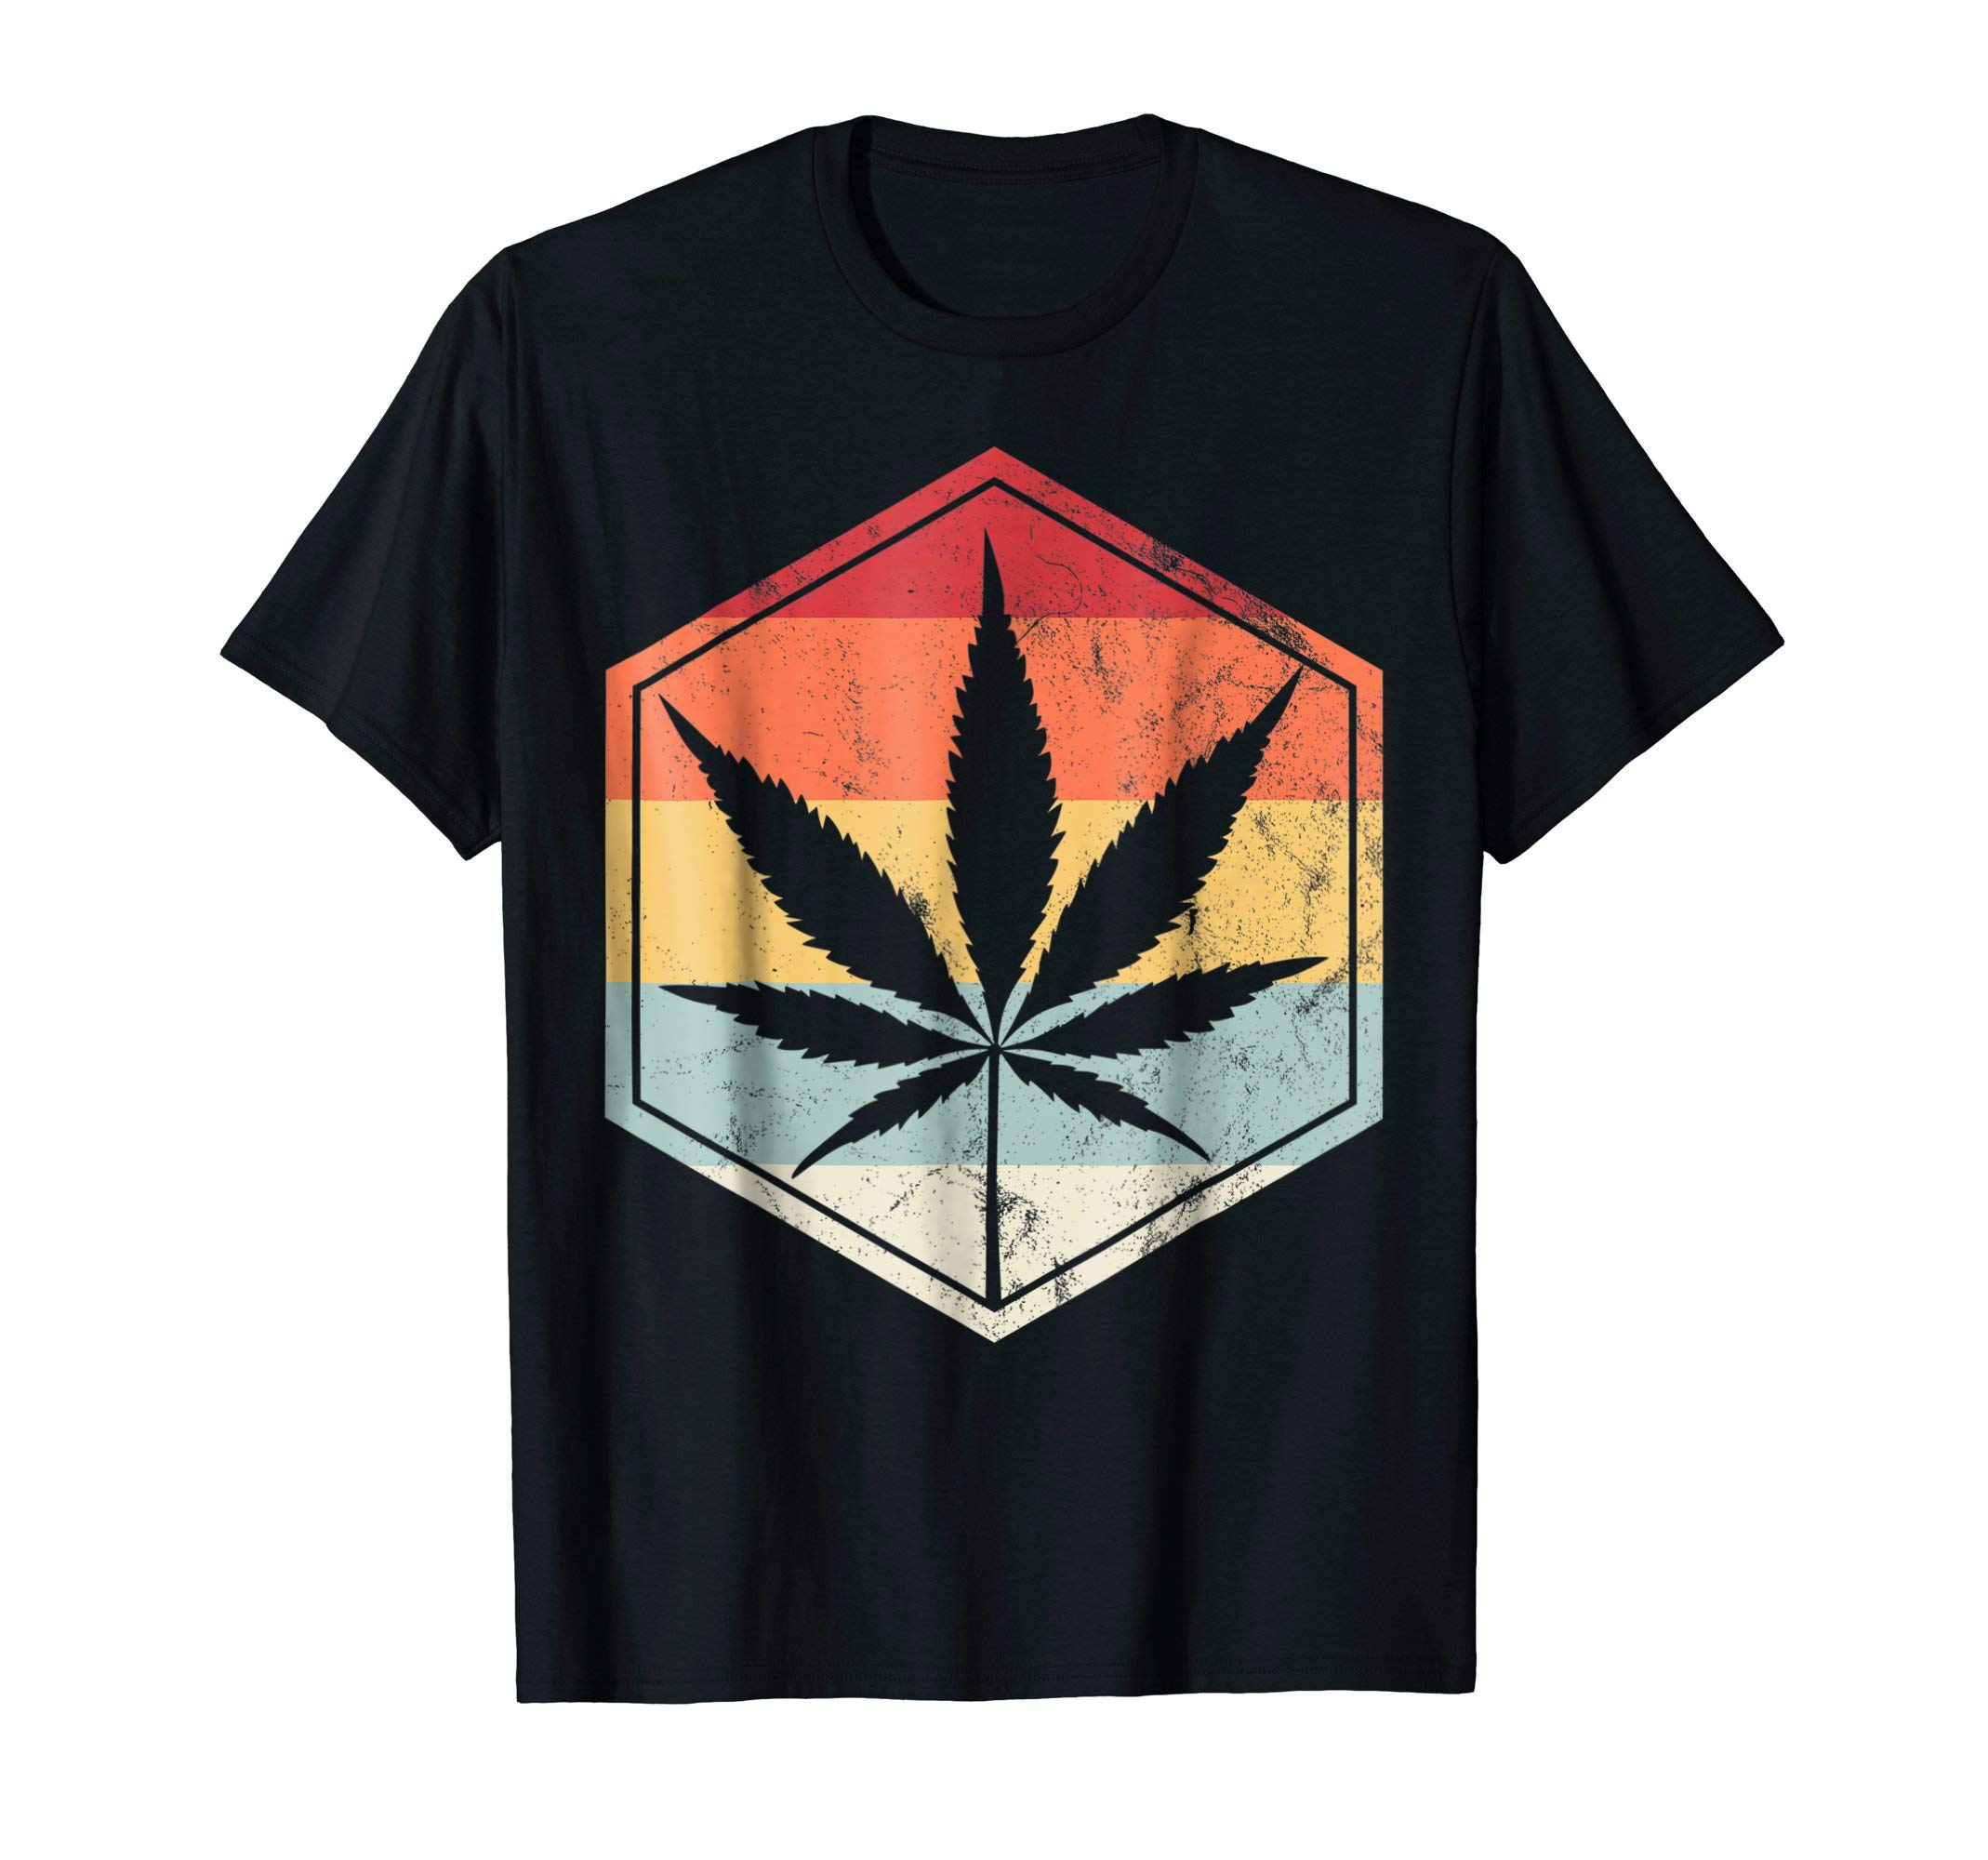 Weed Vintage T-Shirt Marijuana Cannabis Leaf Retro TShirt